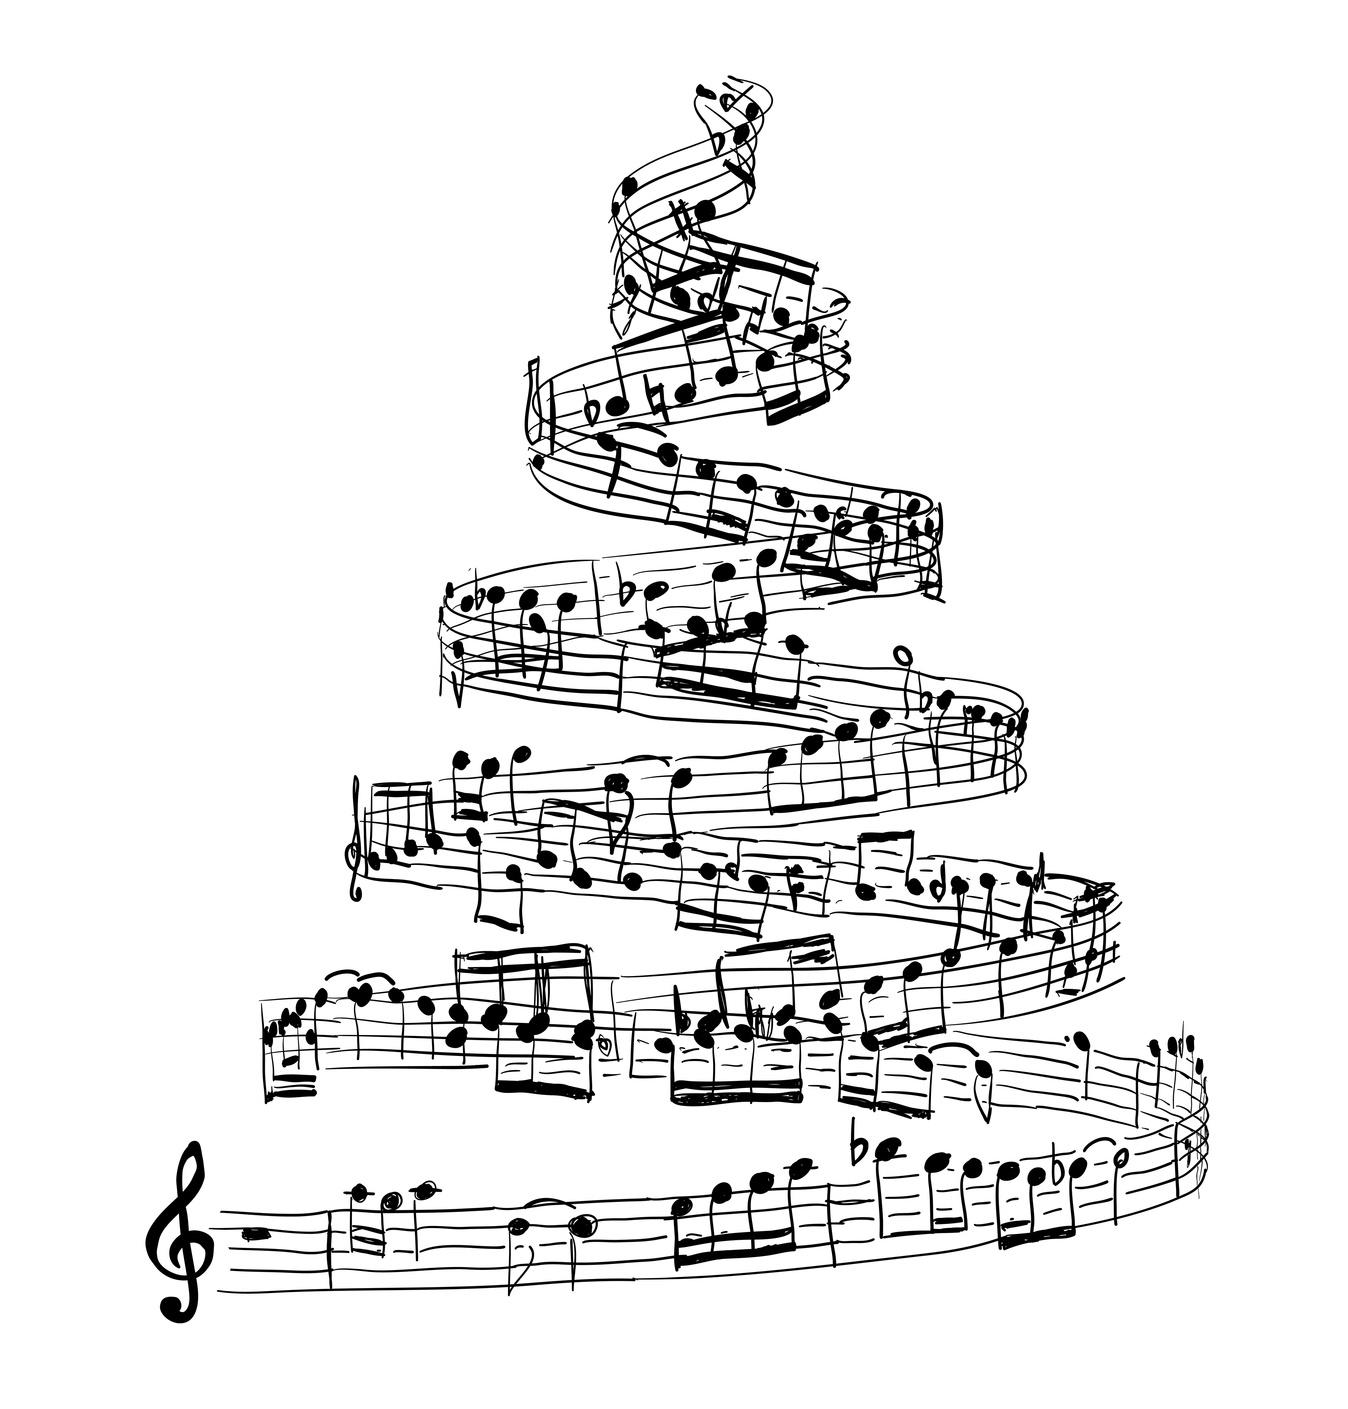 essay deck the halls wuwm - Black Christmas Music